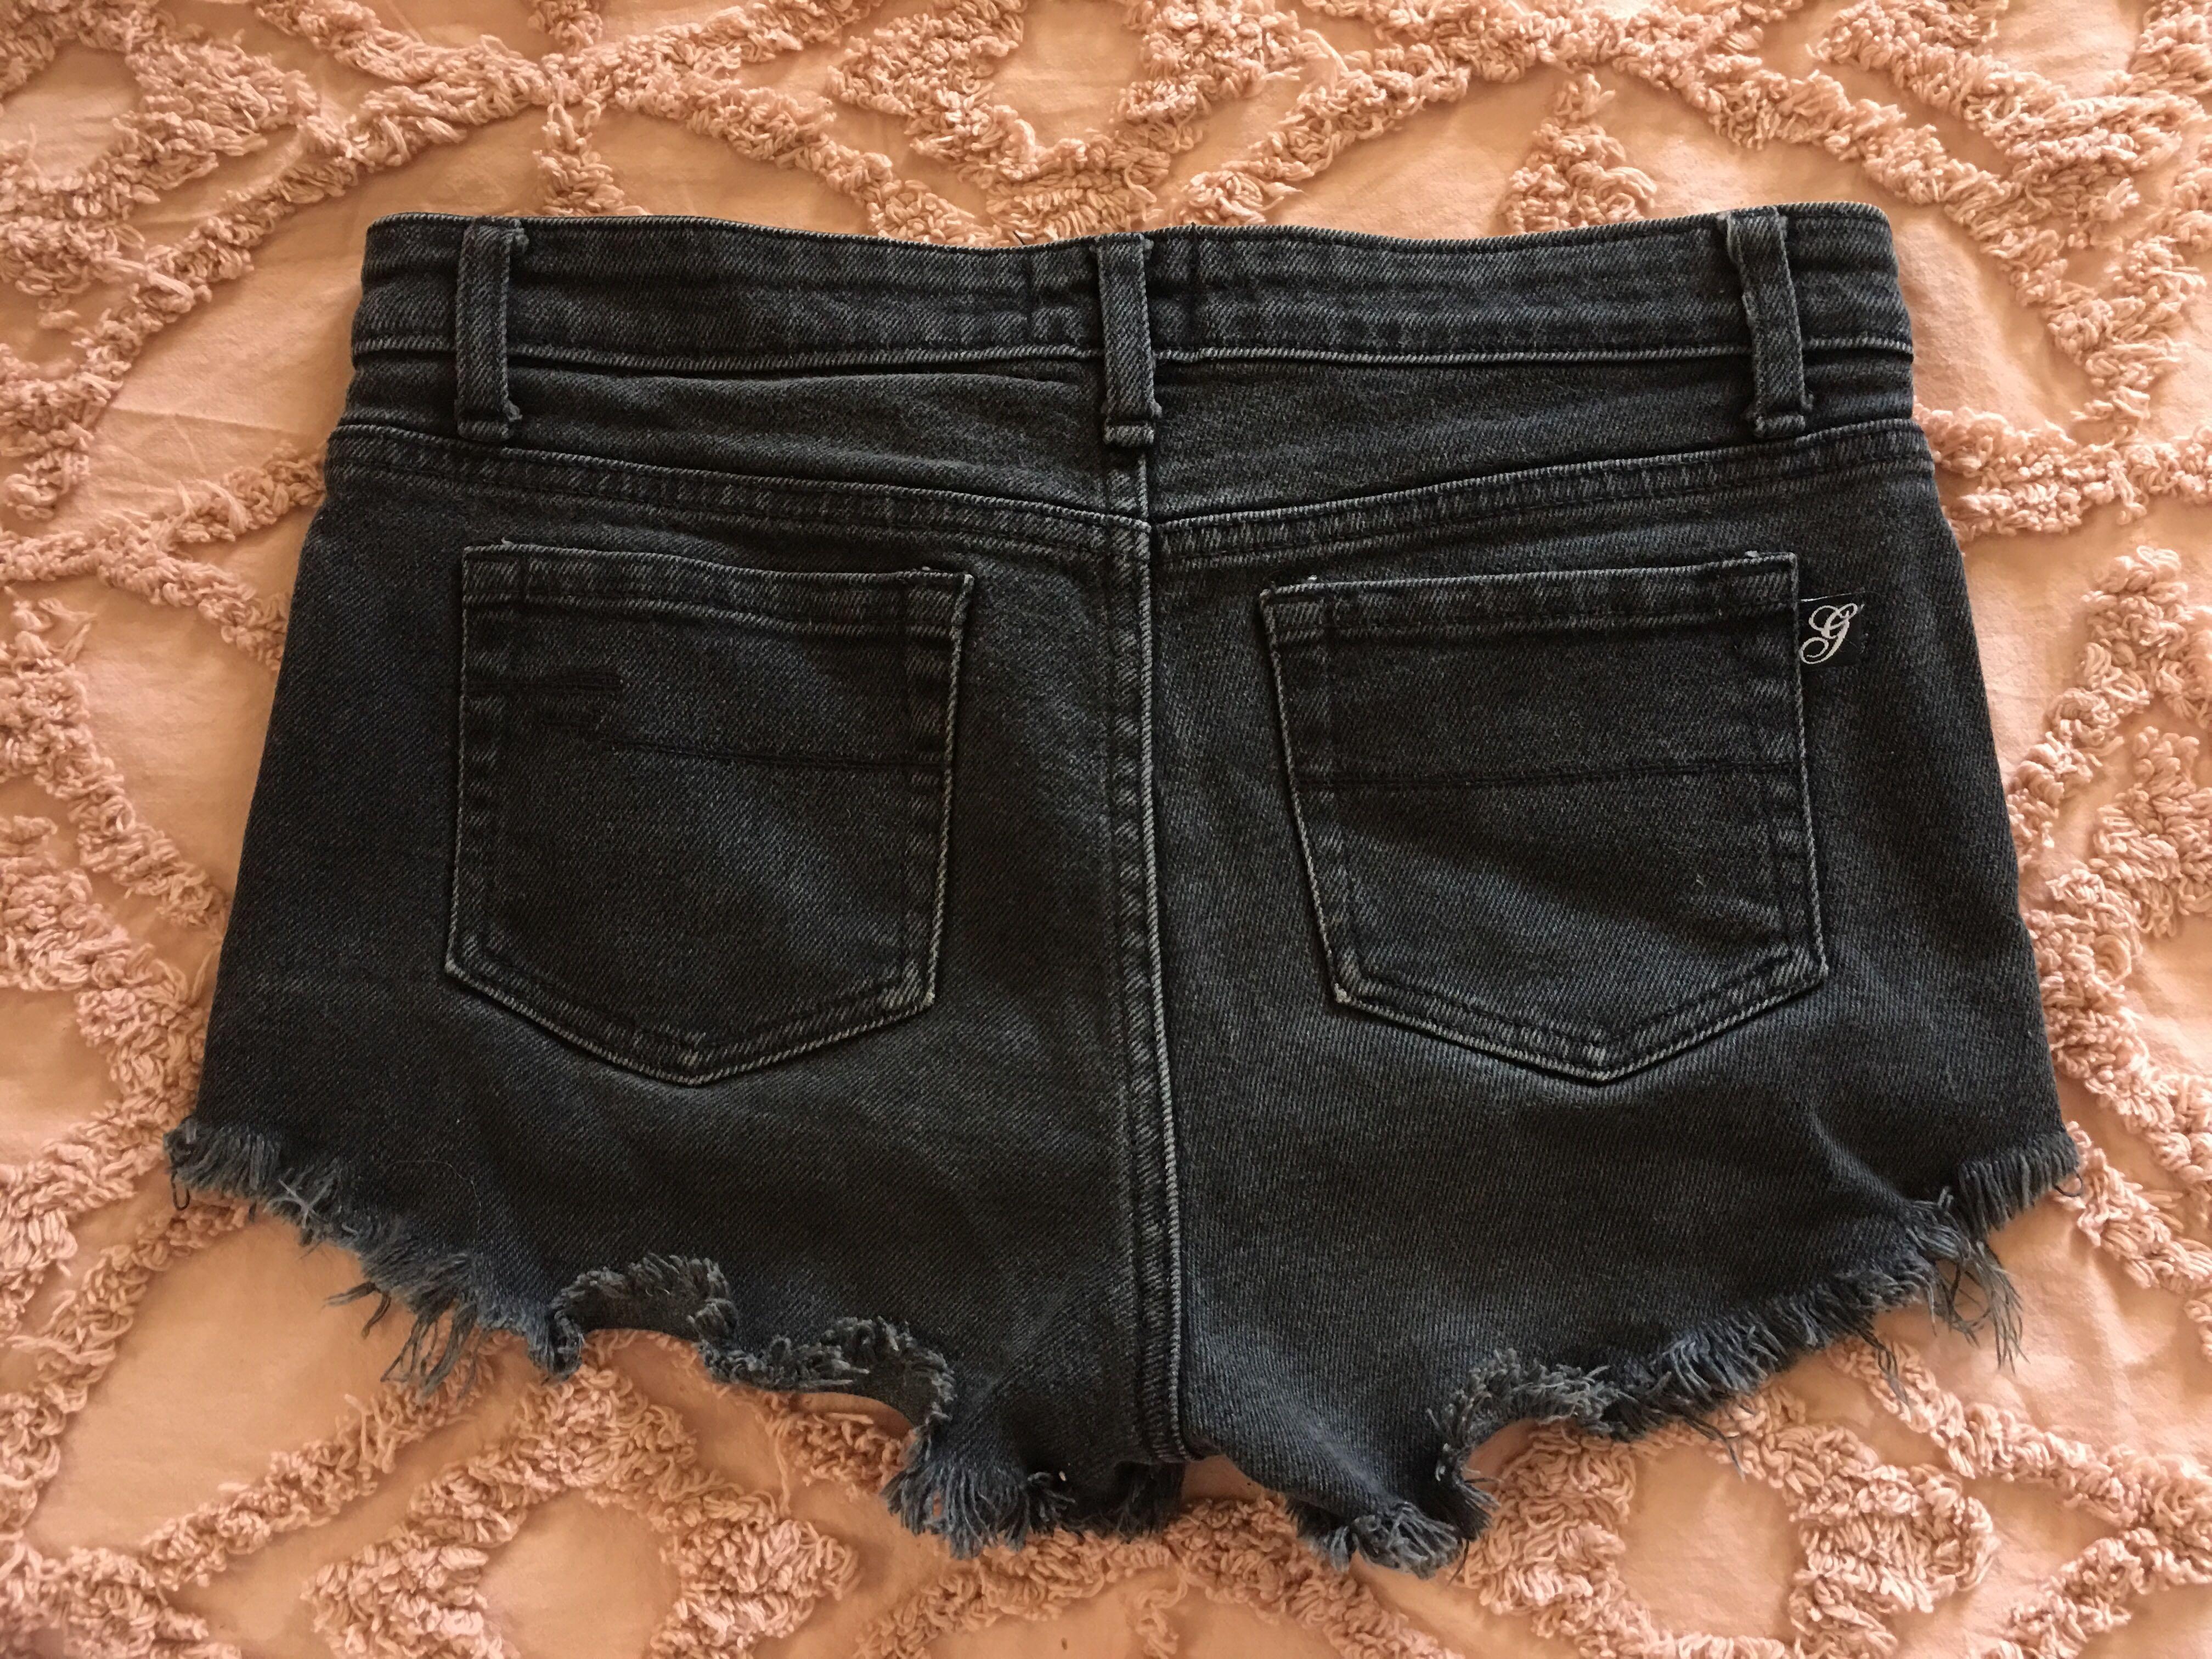 Womens Gripp Jeans Stretch Denim Cut Off Shorts 6-8